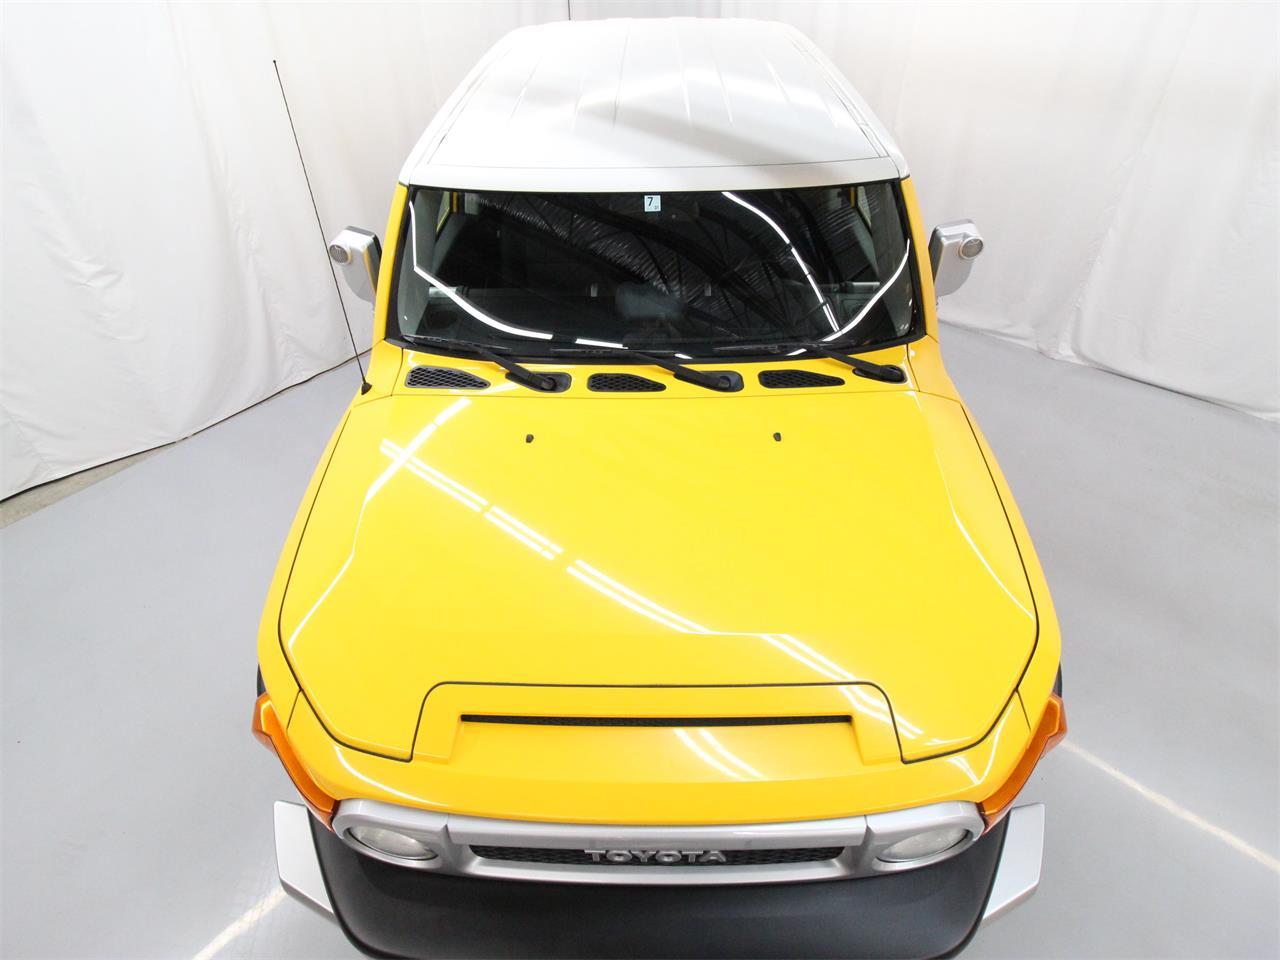 2010 Toyota FJ Cruiser (CC-1337527) for sale in Christiansburg, Virginia